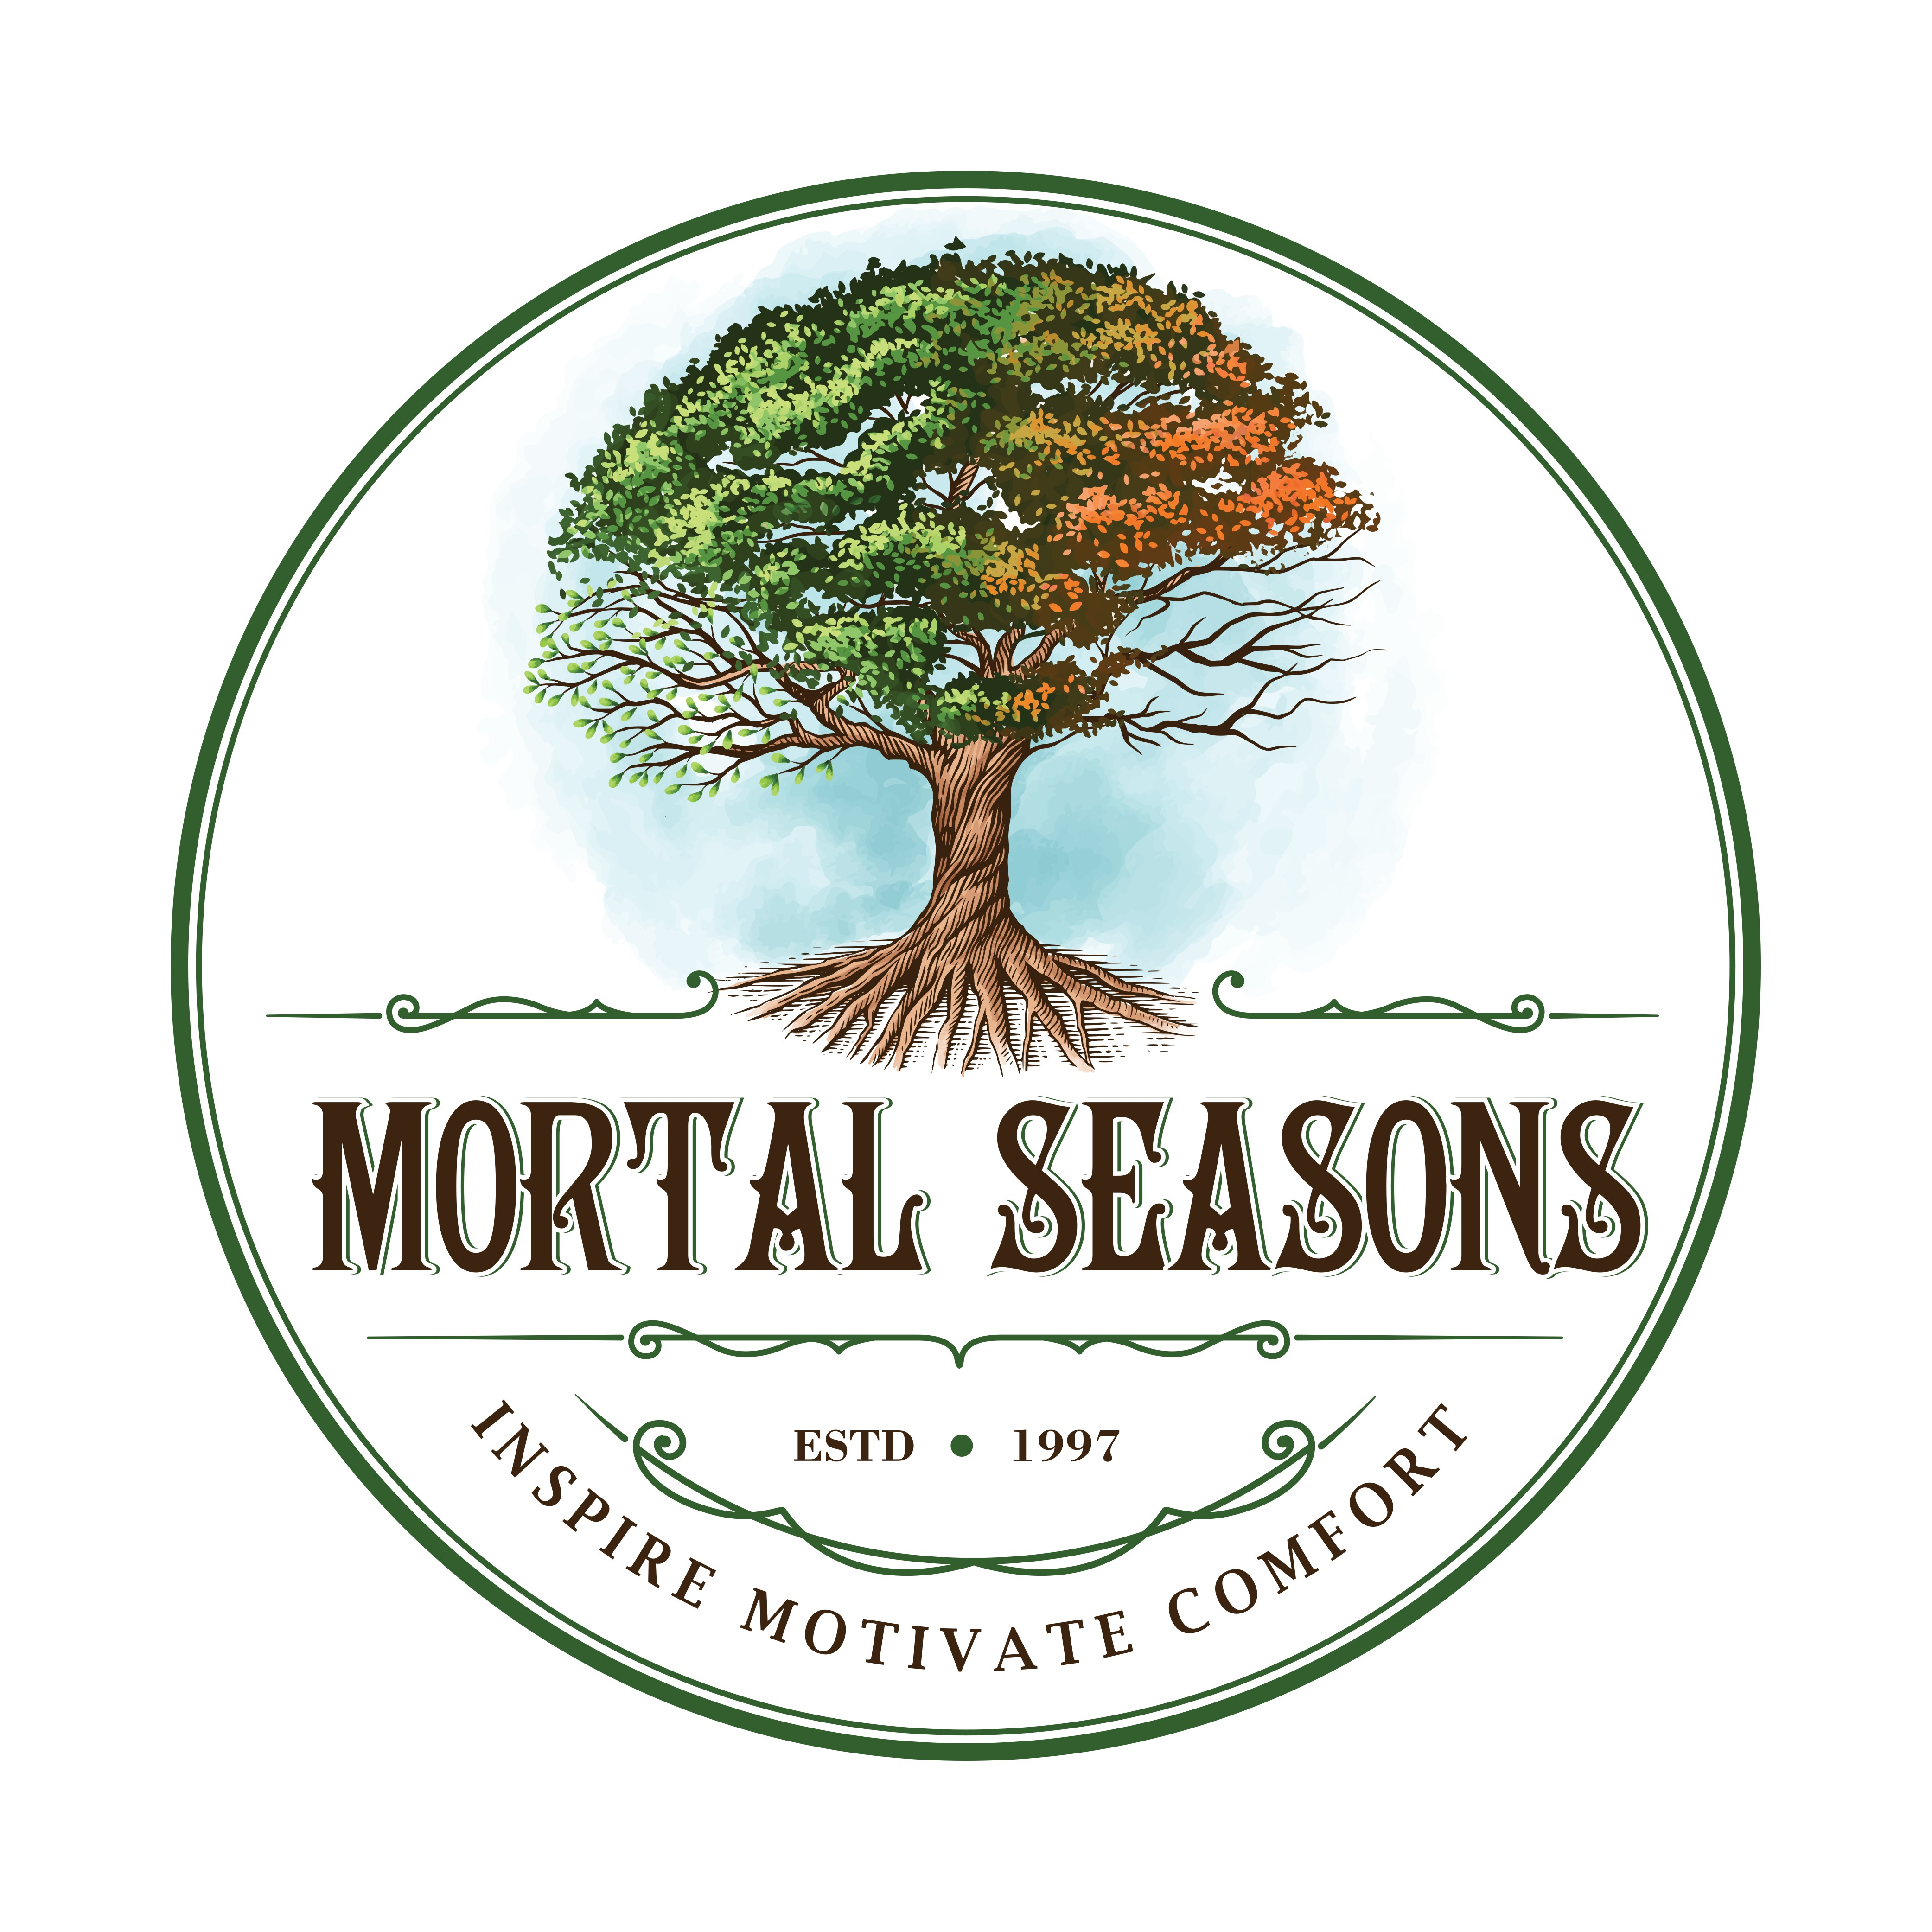 Revision to MORTAL SEASONS logo